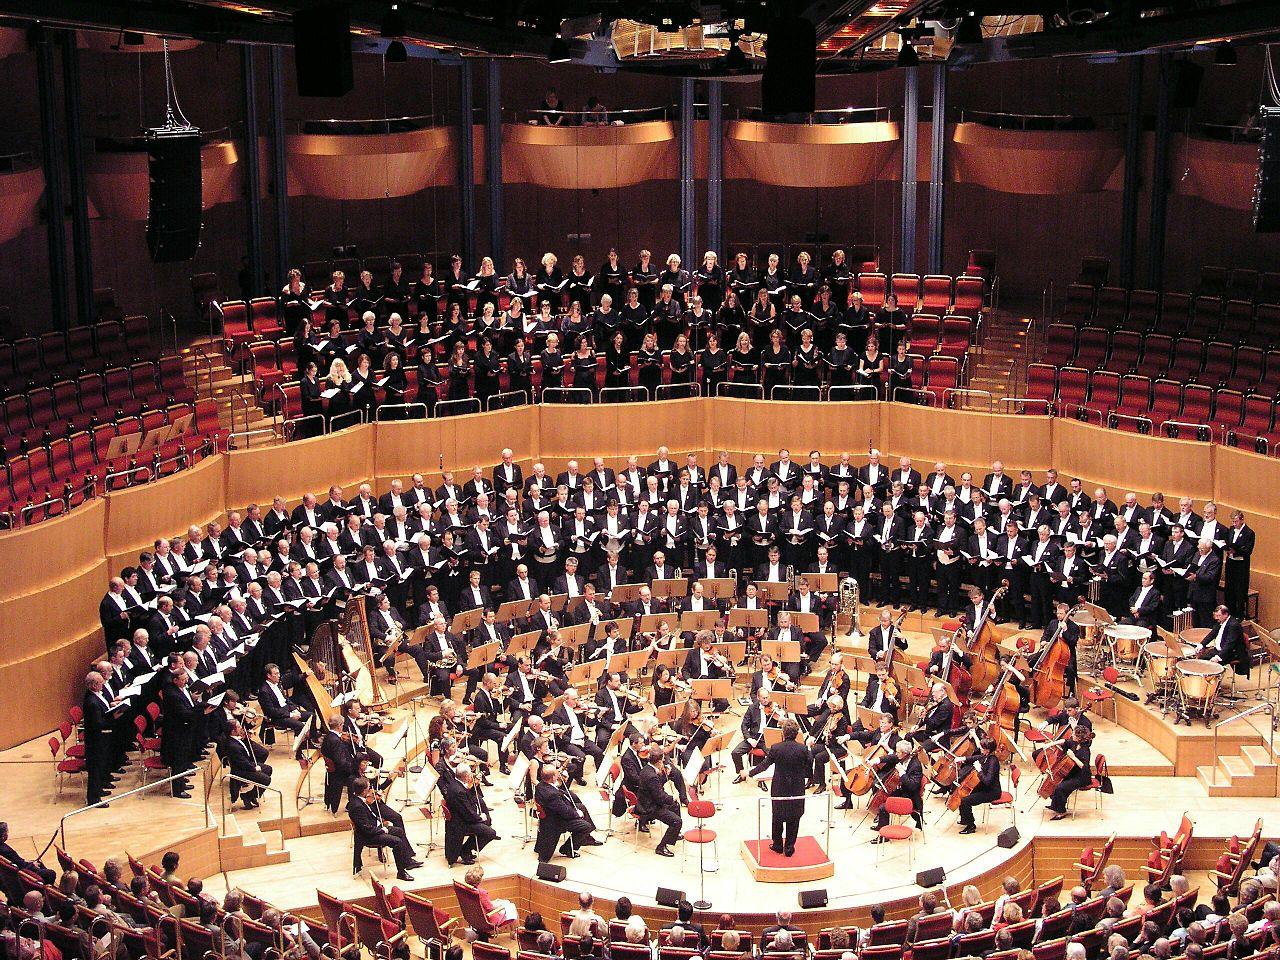 Bild Kölner Philharmonie